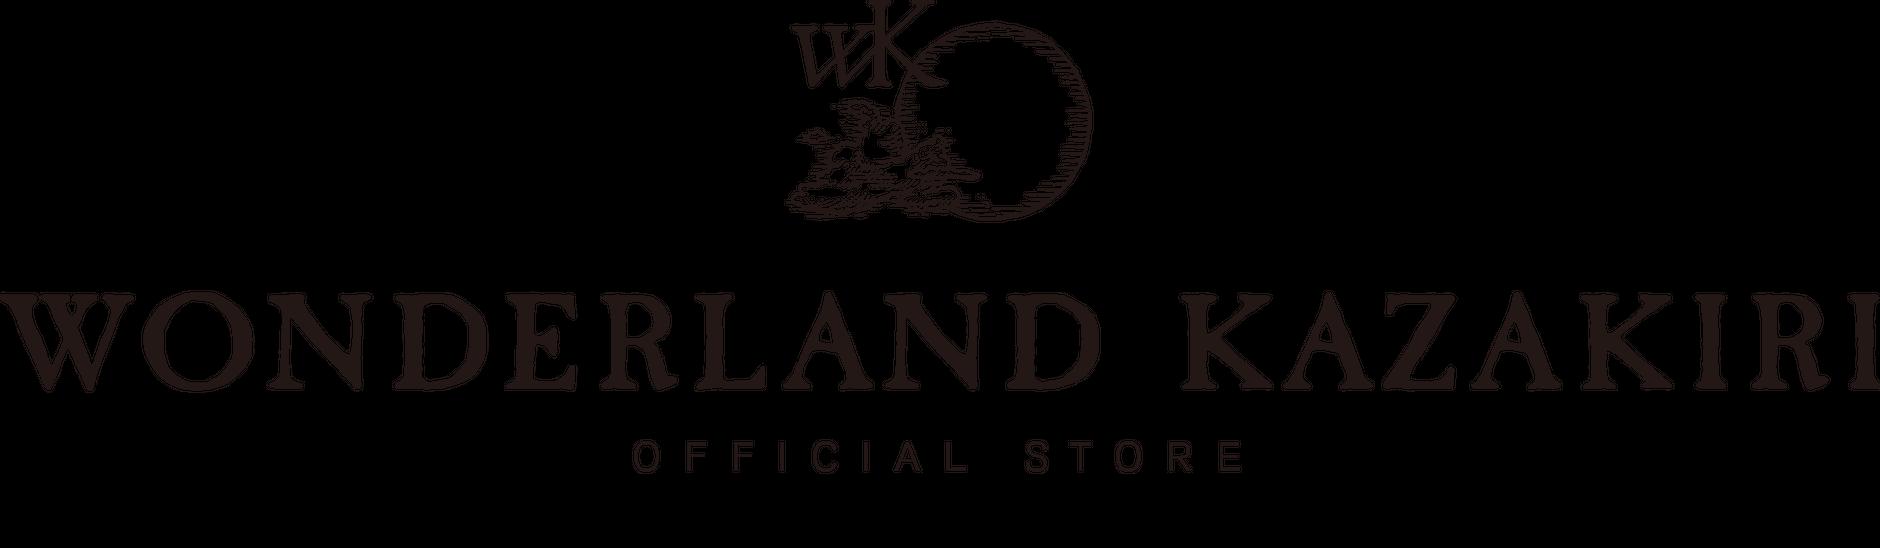 Wonderland Kazakiri Official Store